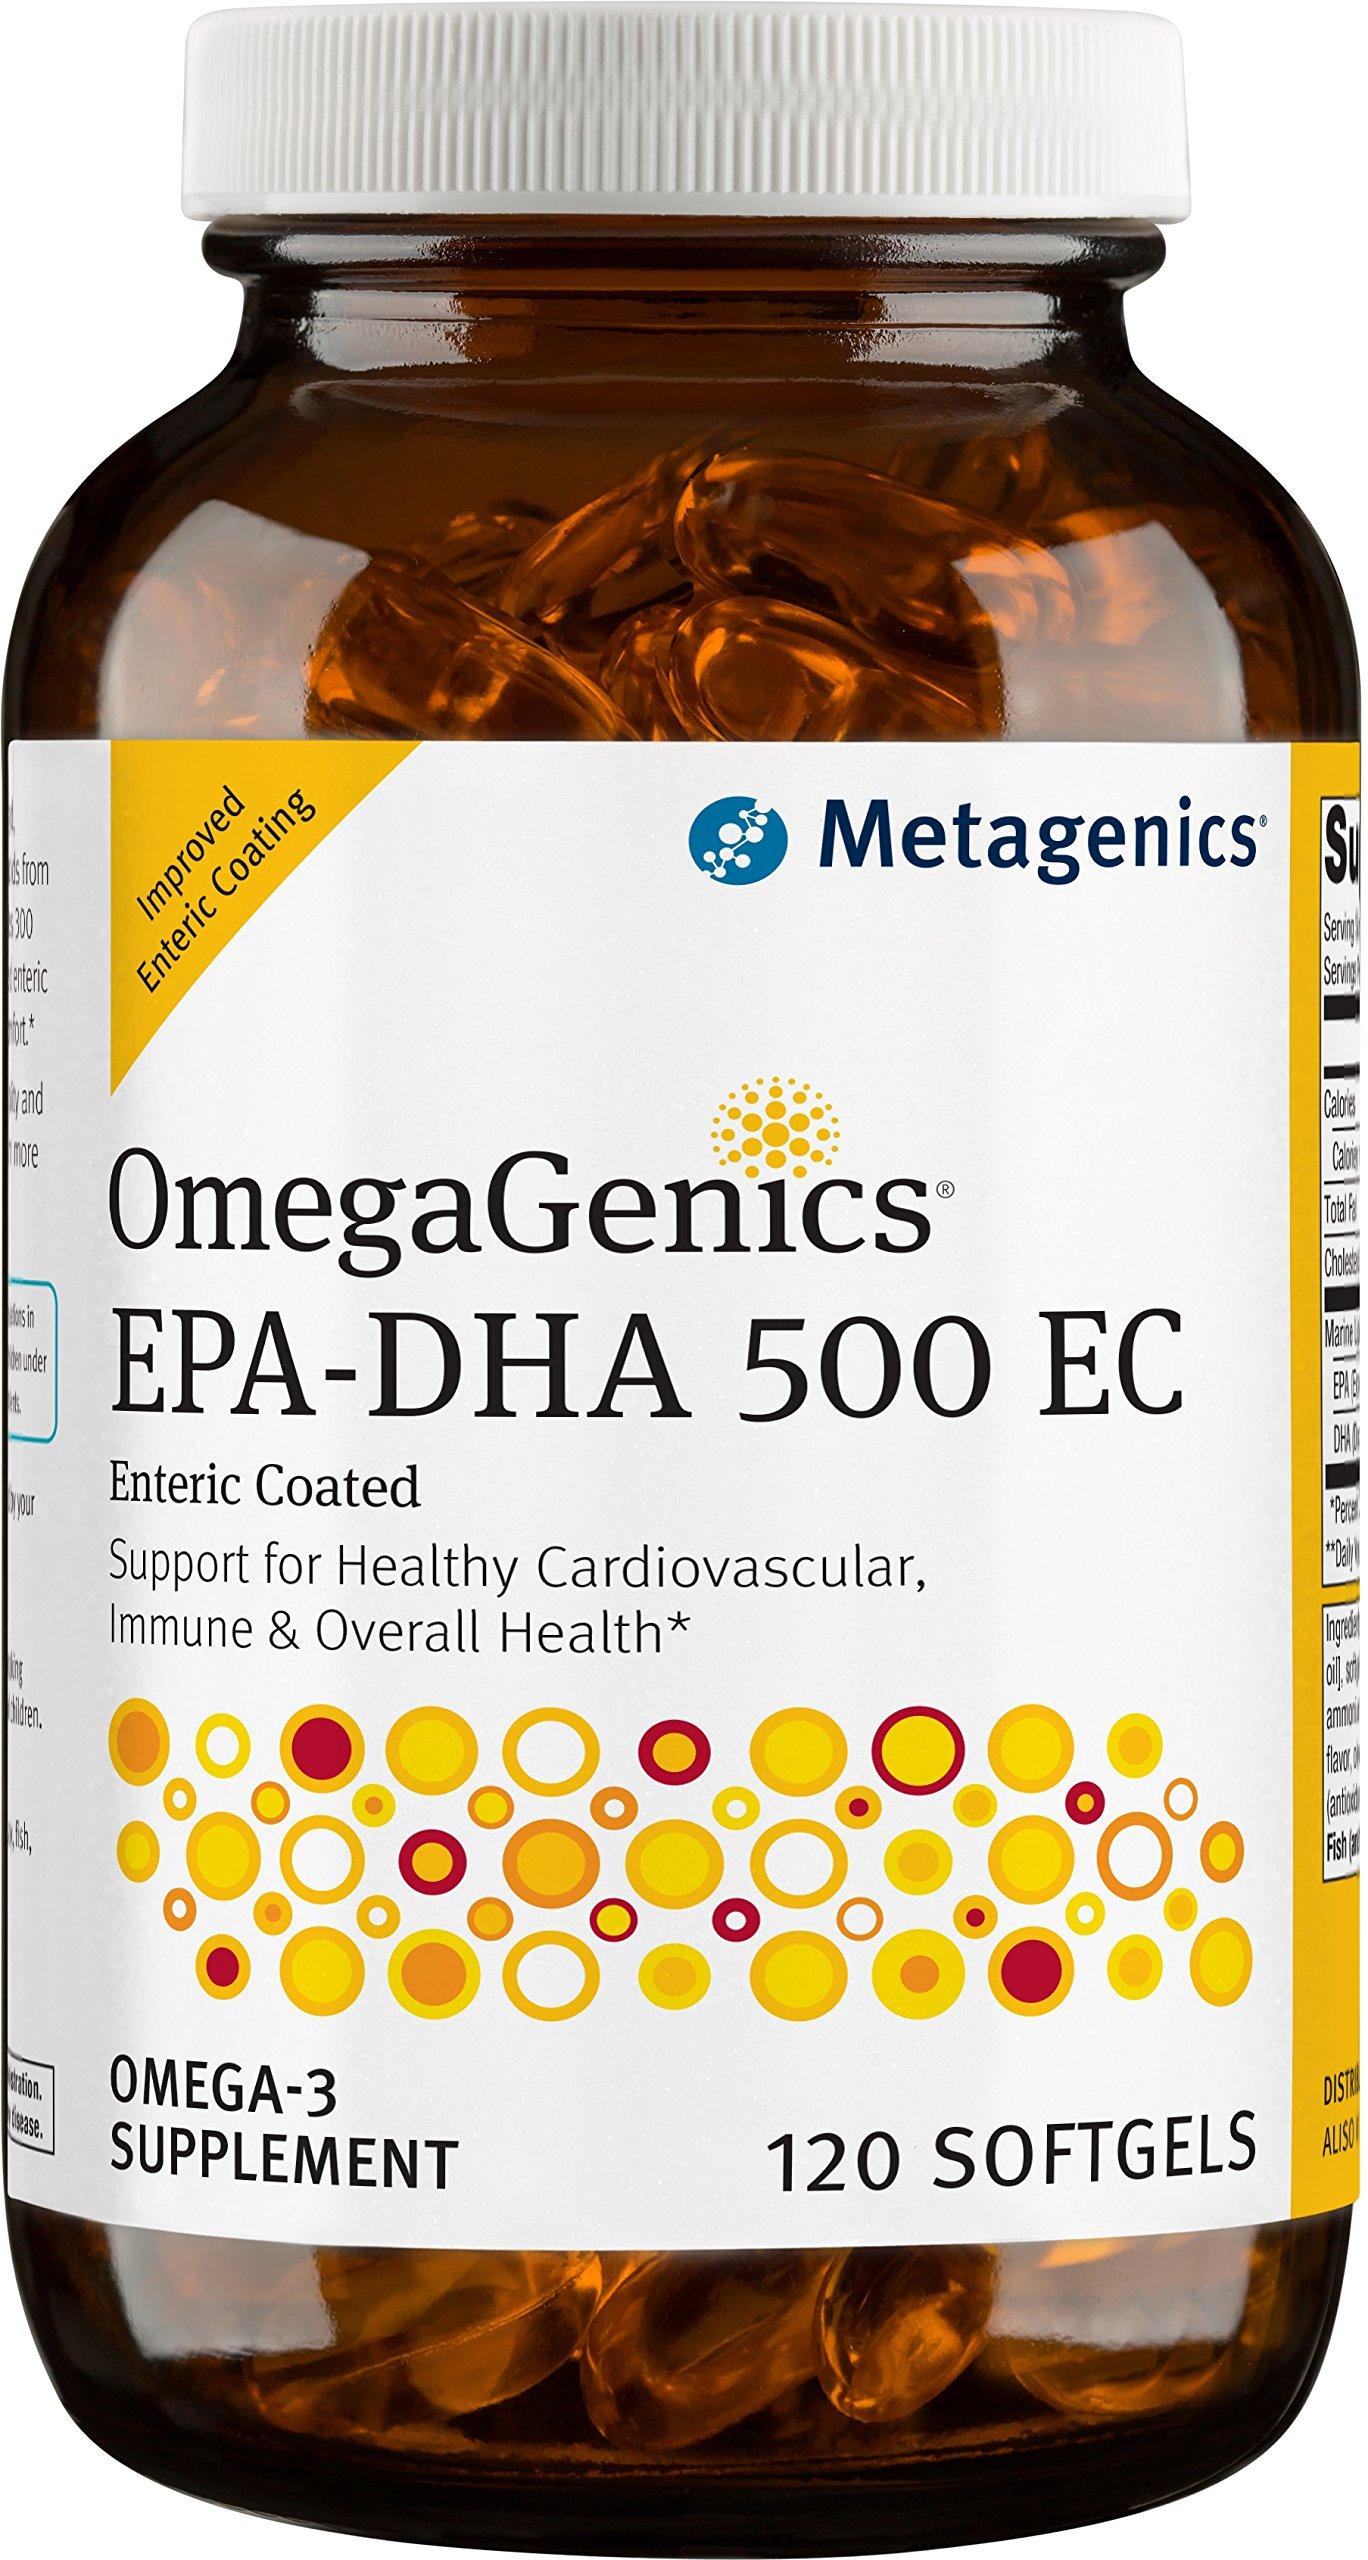 Metagenics - OmegaGenics EPA-DHA 500 EC, 120 Count